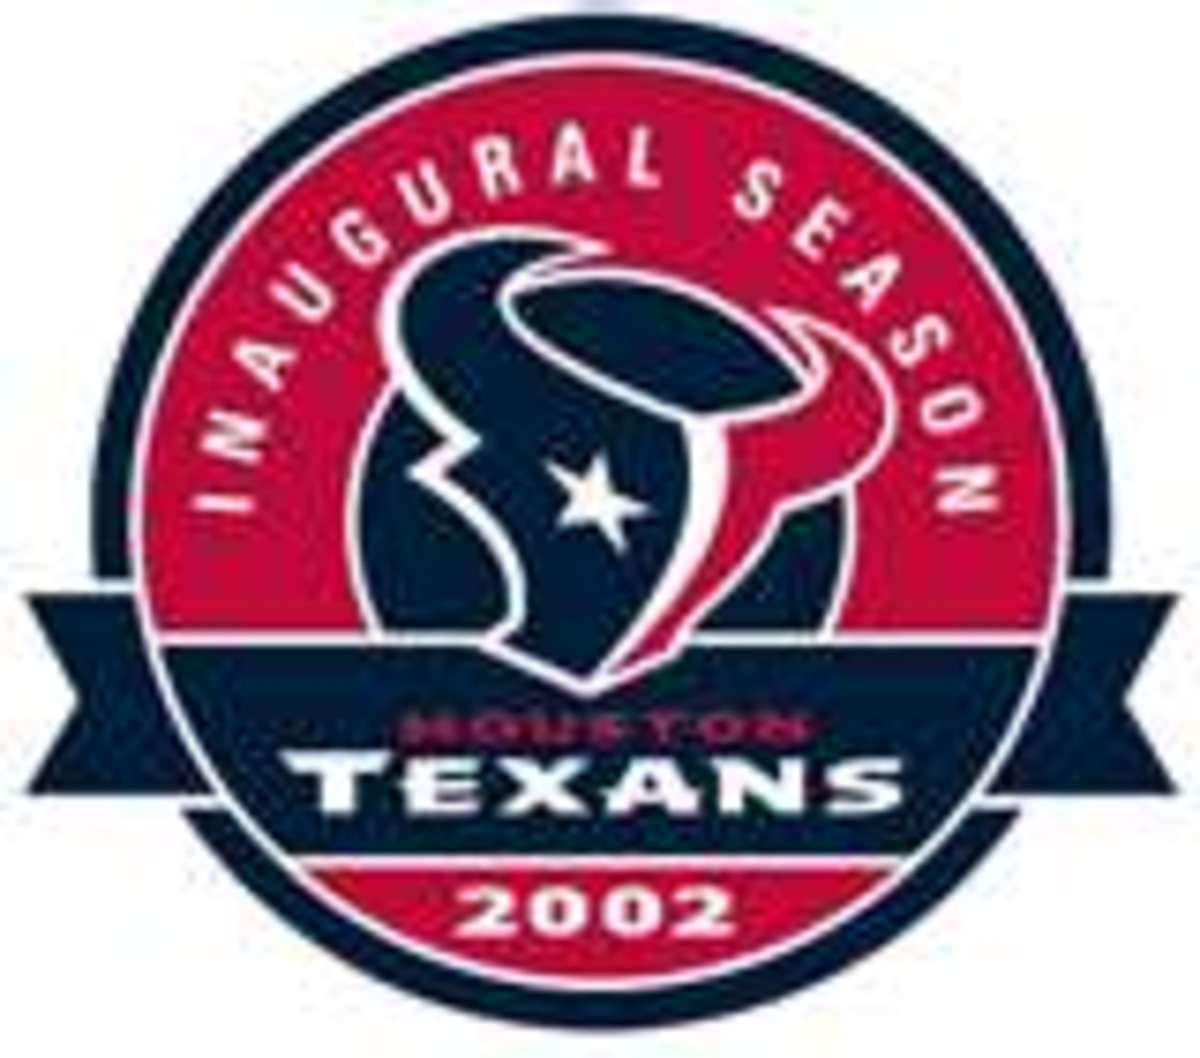 Texans Inagural Patch